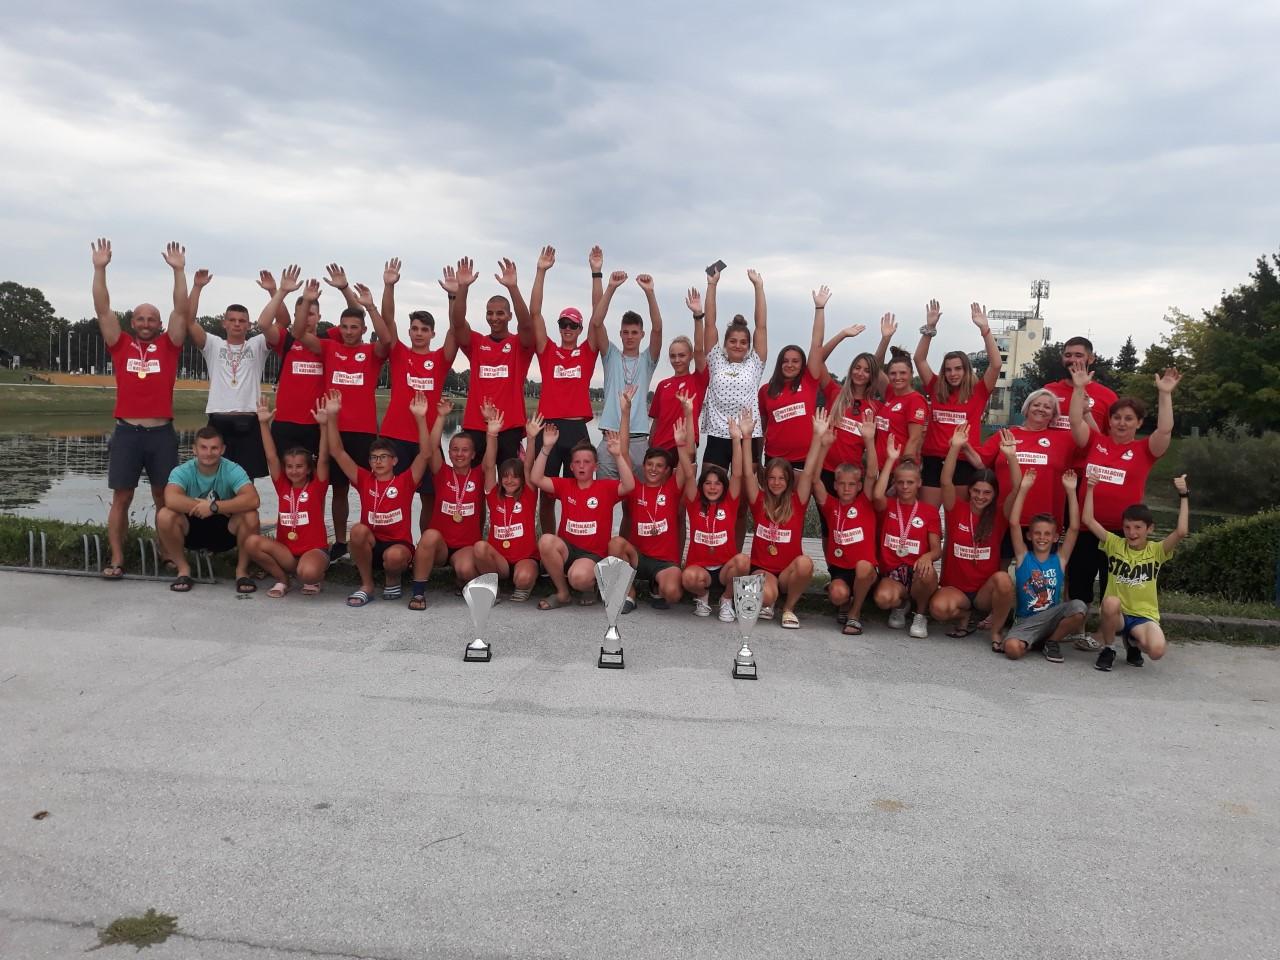 Olimpik obranio naslove prvaka Hrvatske